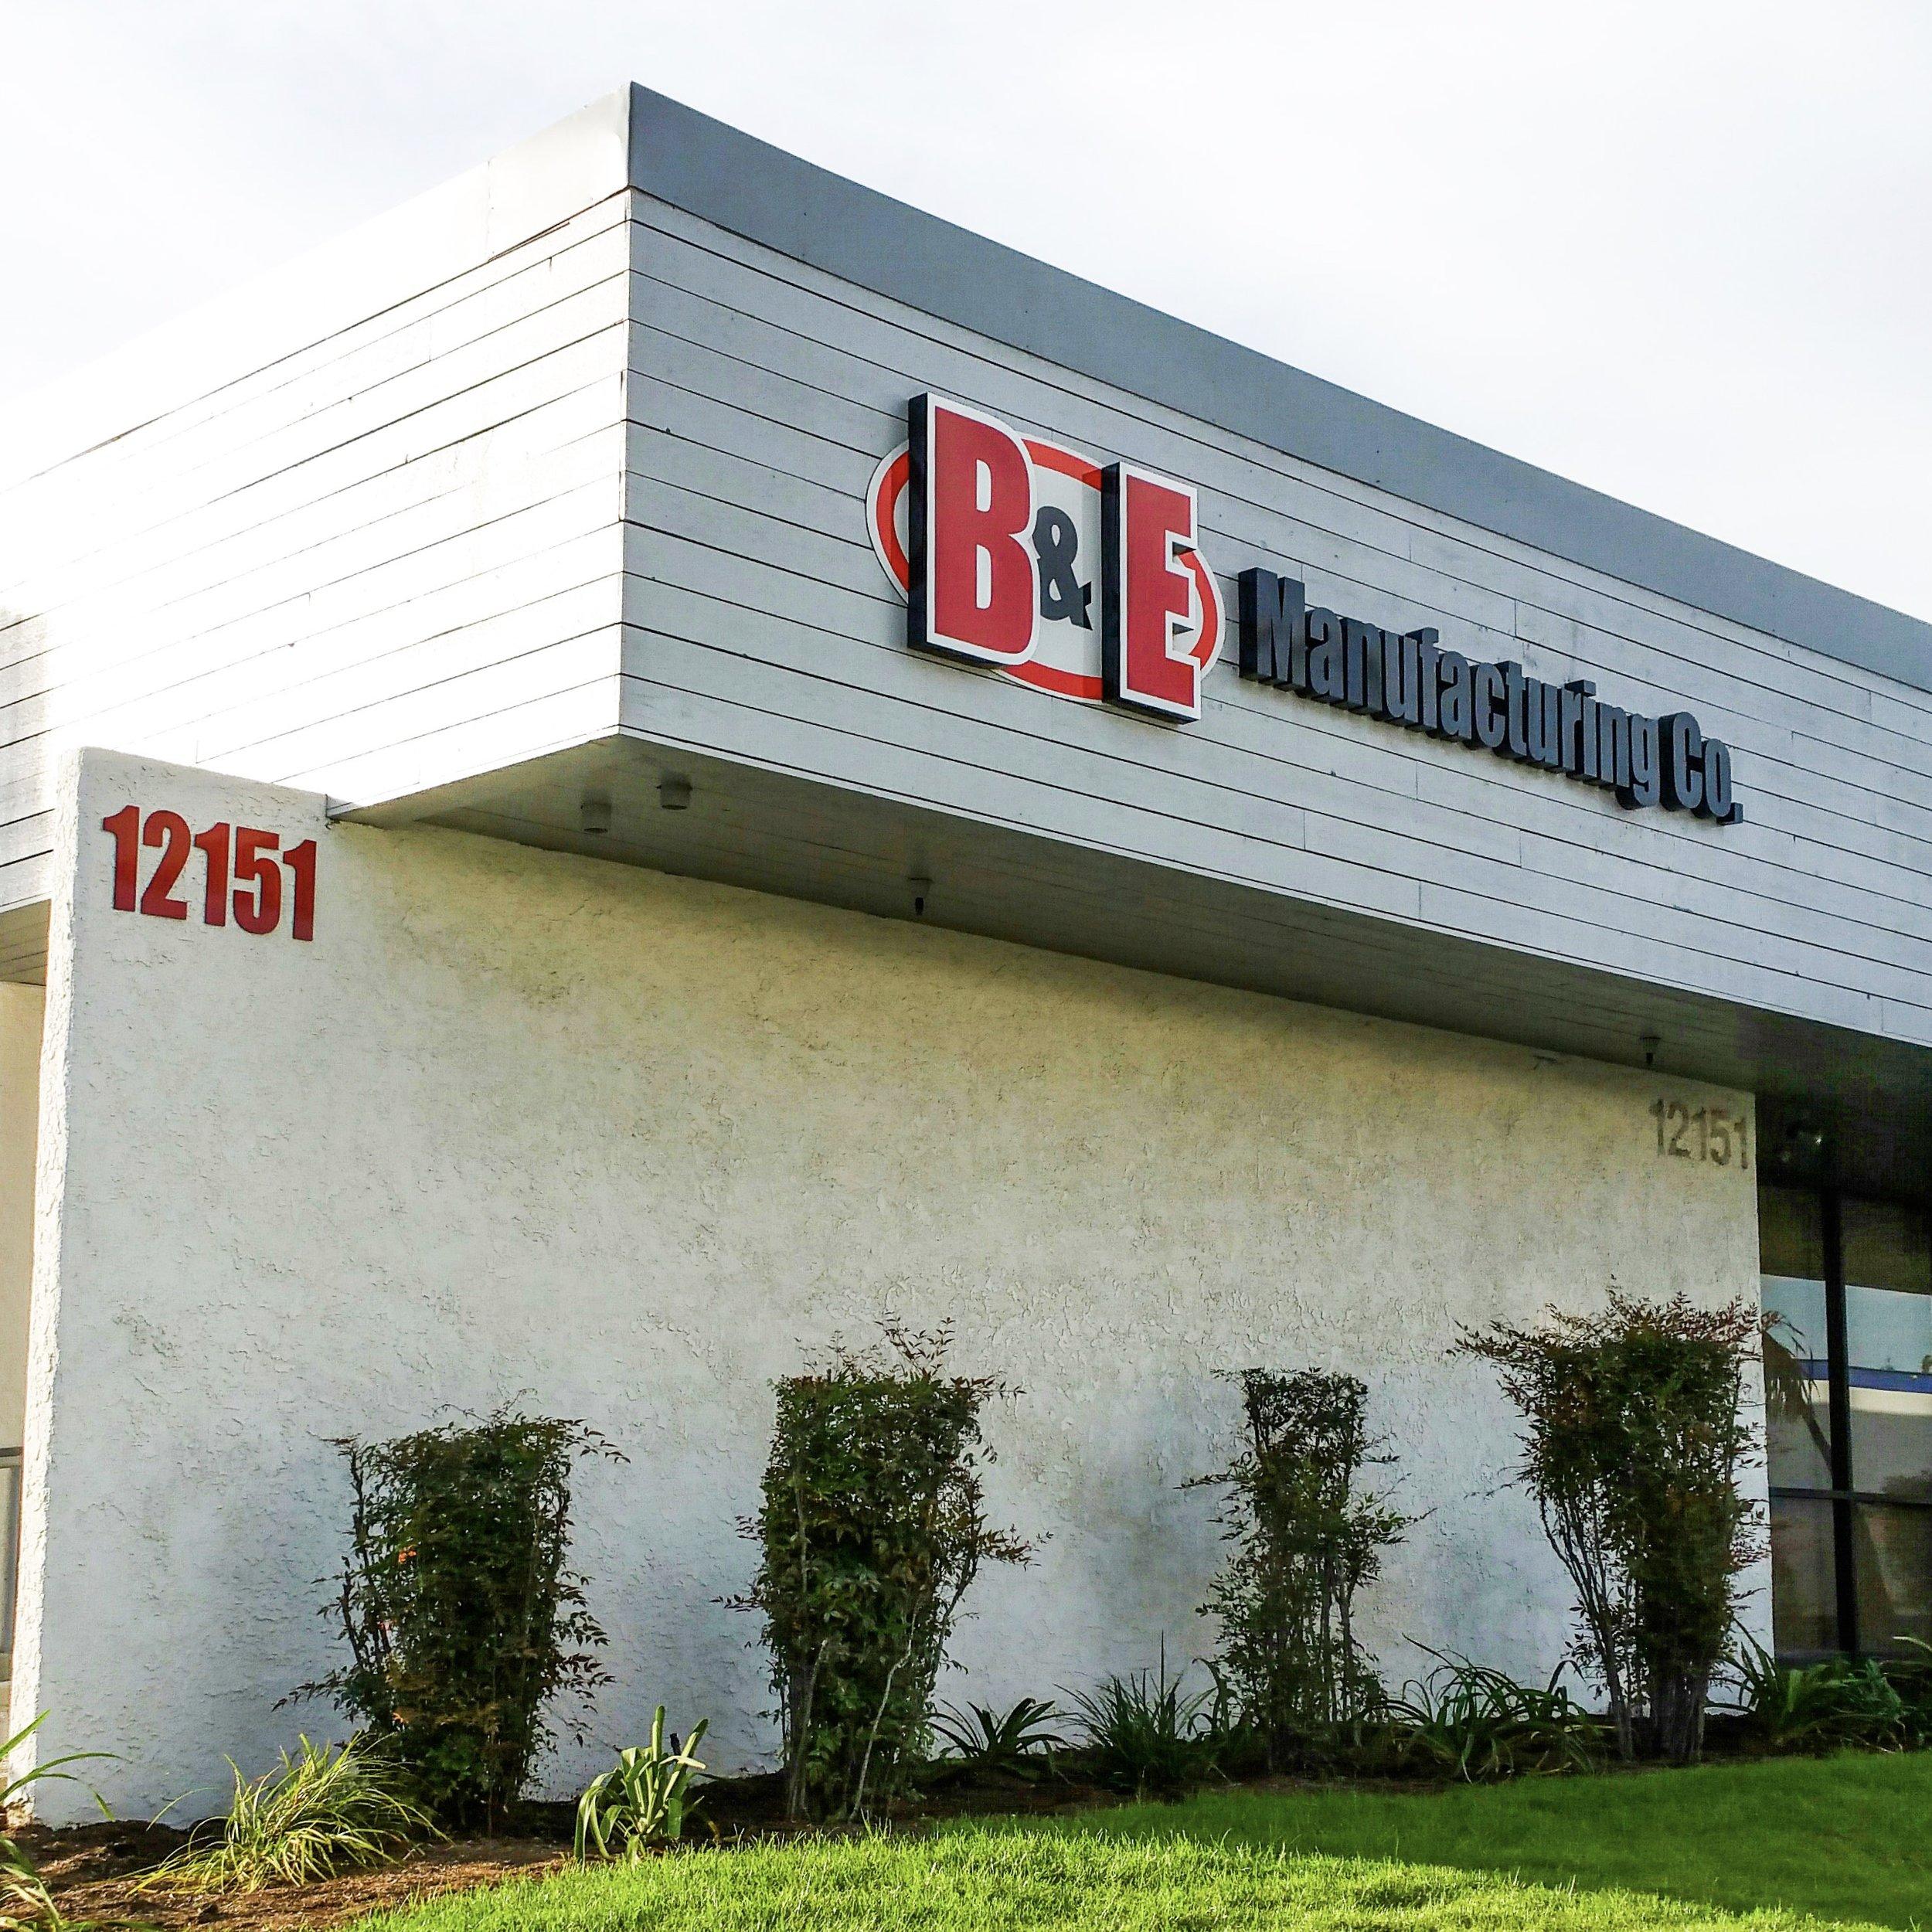 B & E Manufacturing dimensional letters & logo